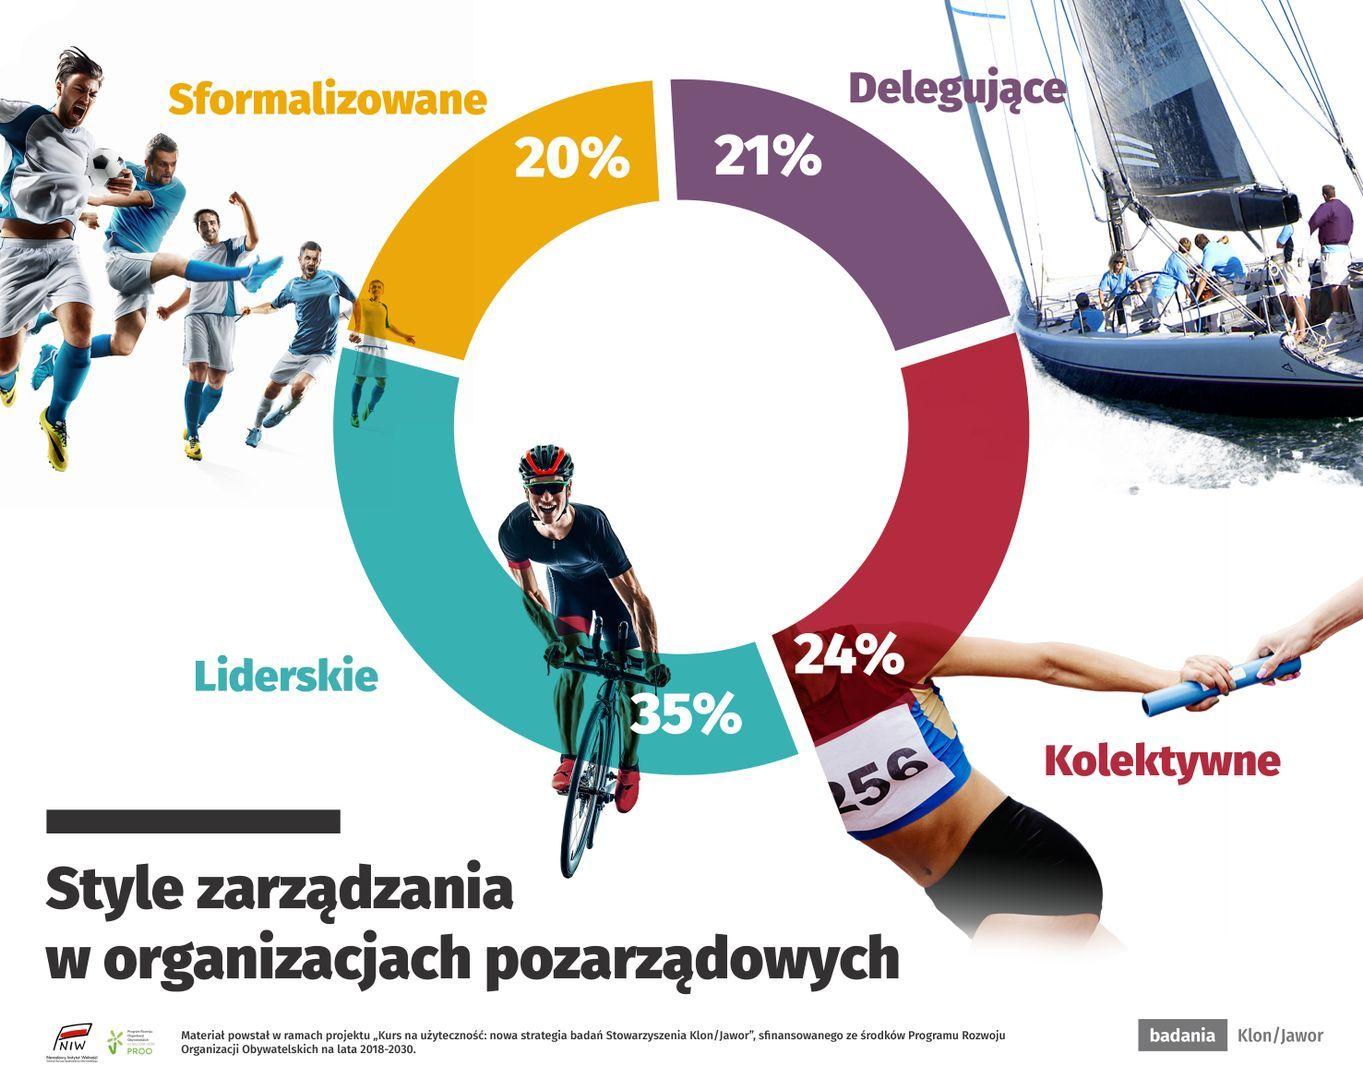 POD LUPĄ ngo.pl. Style zarządzania